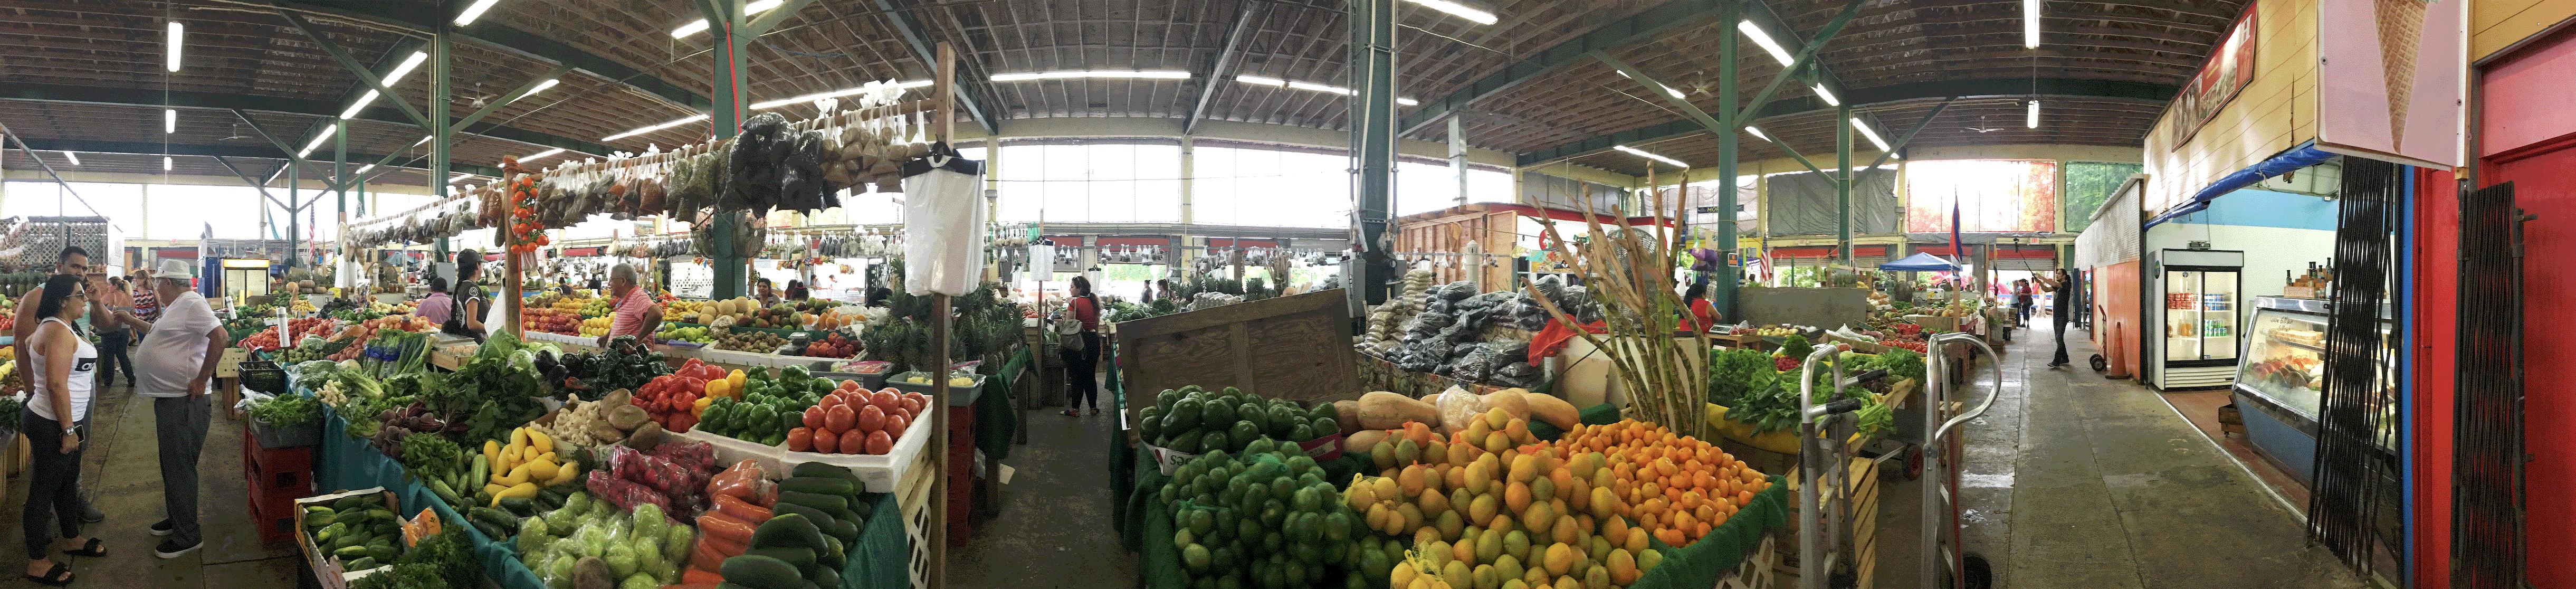 redland-farmers-market